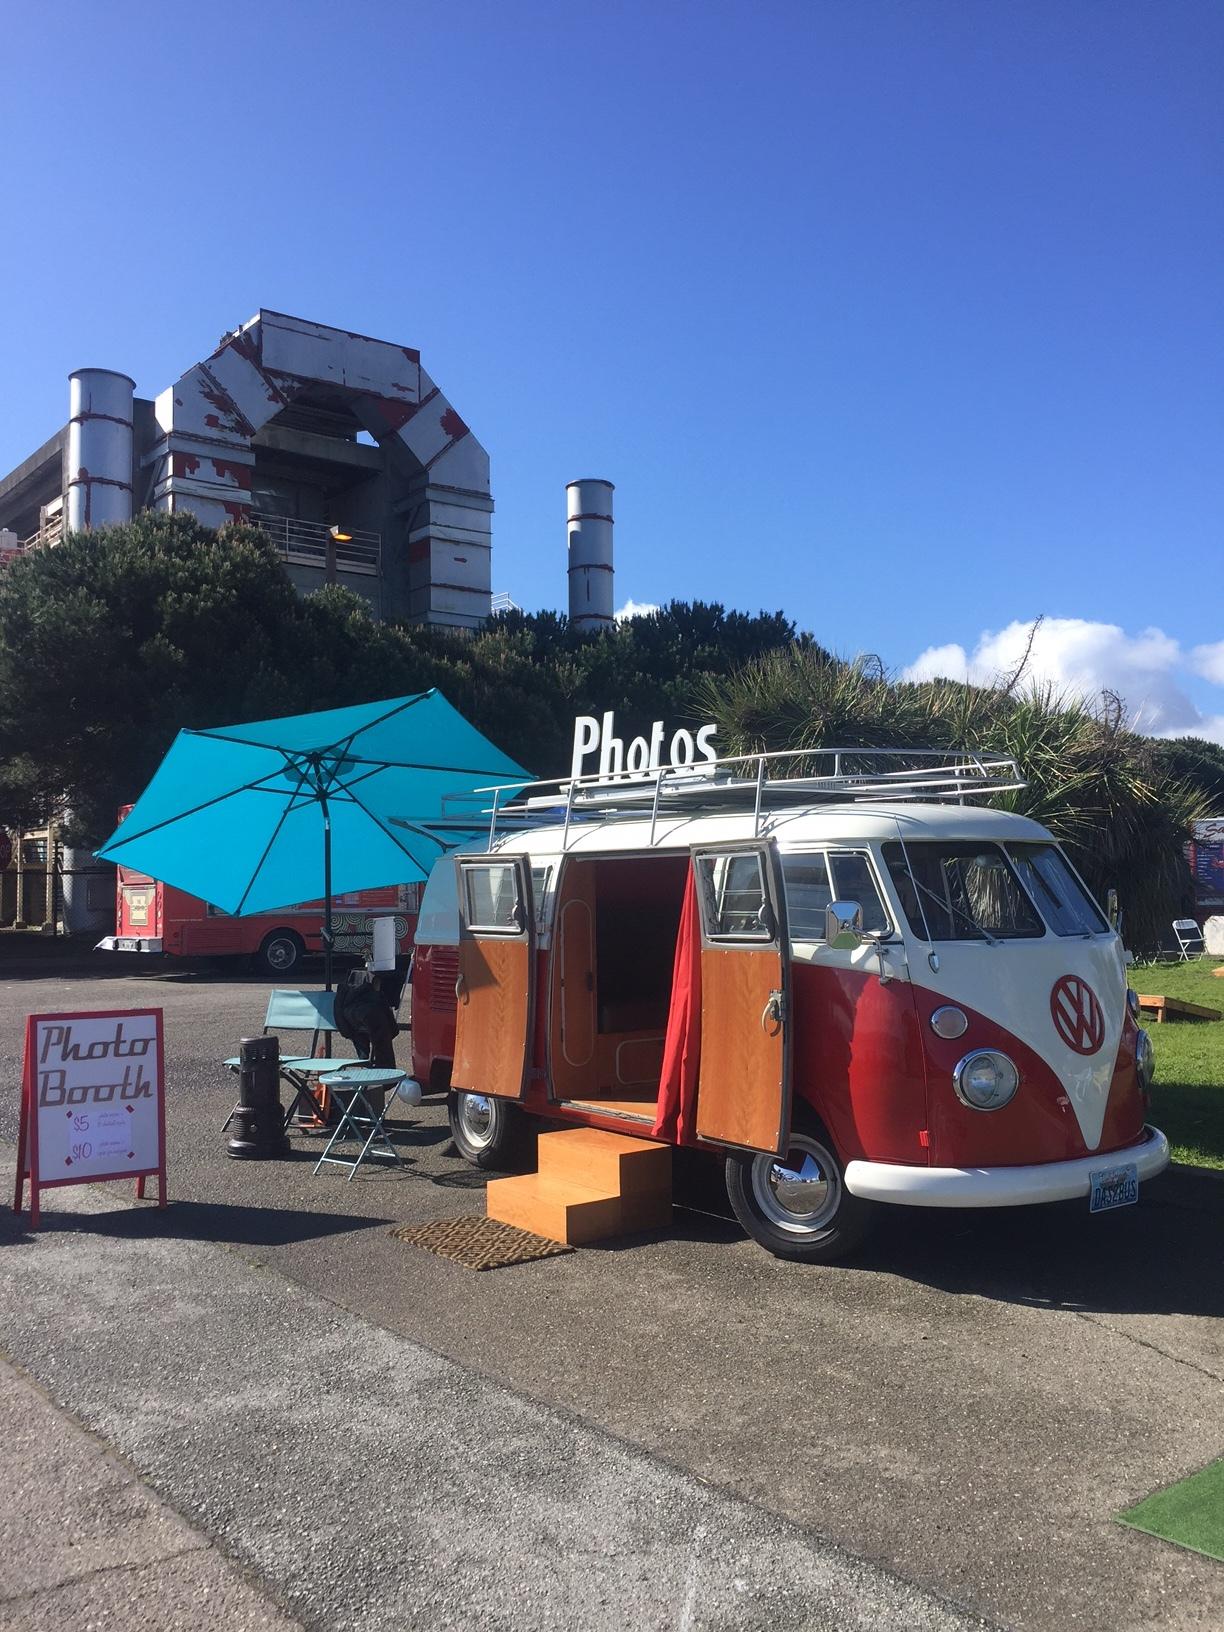 Das Bus at Treasure Fest last month debuting the solar setup!